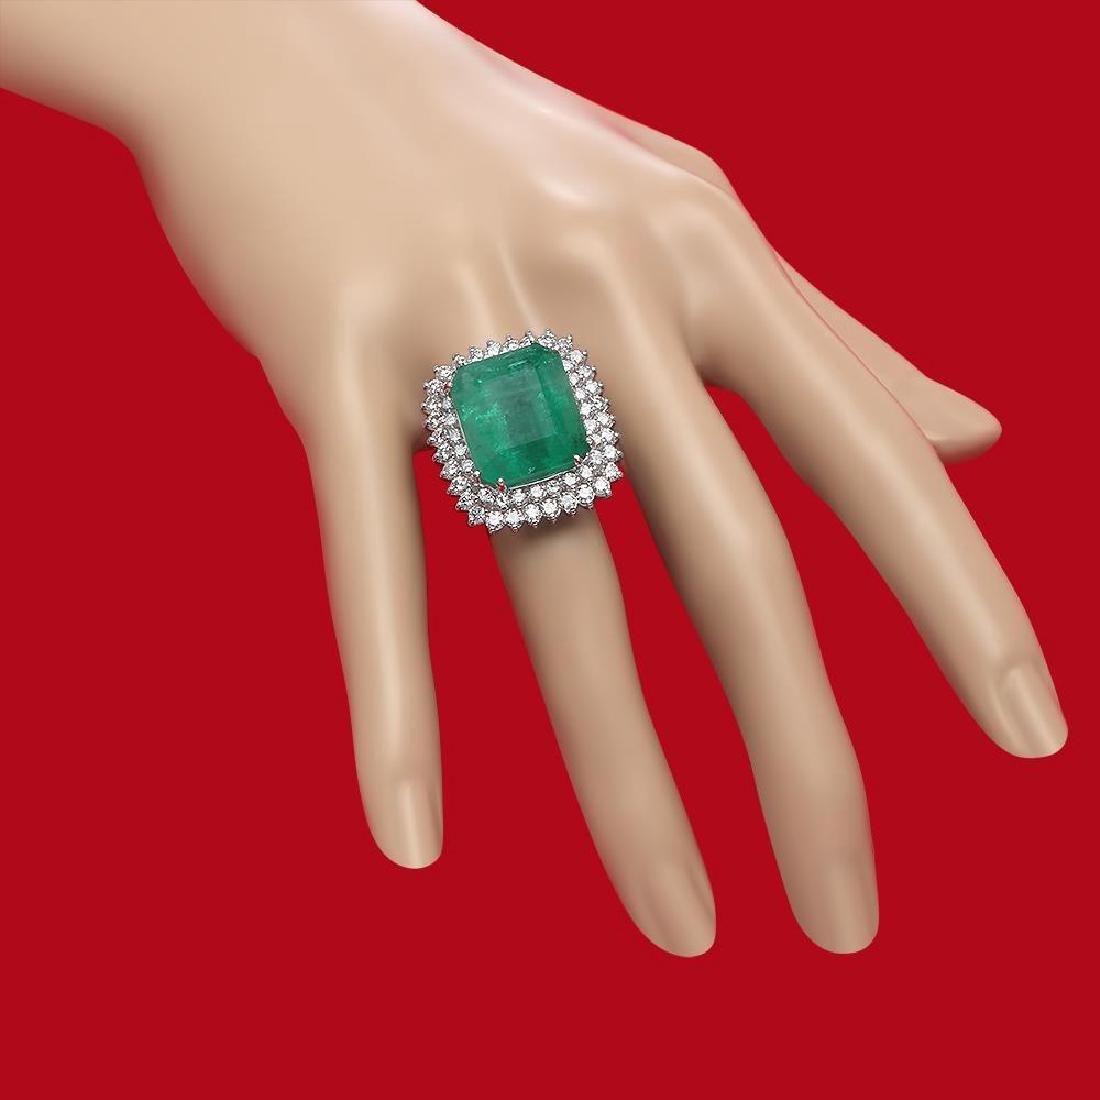 14K Gold 19.12 Emerald 2.75 Diamond Ring - 3